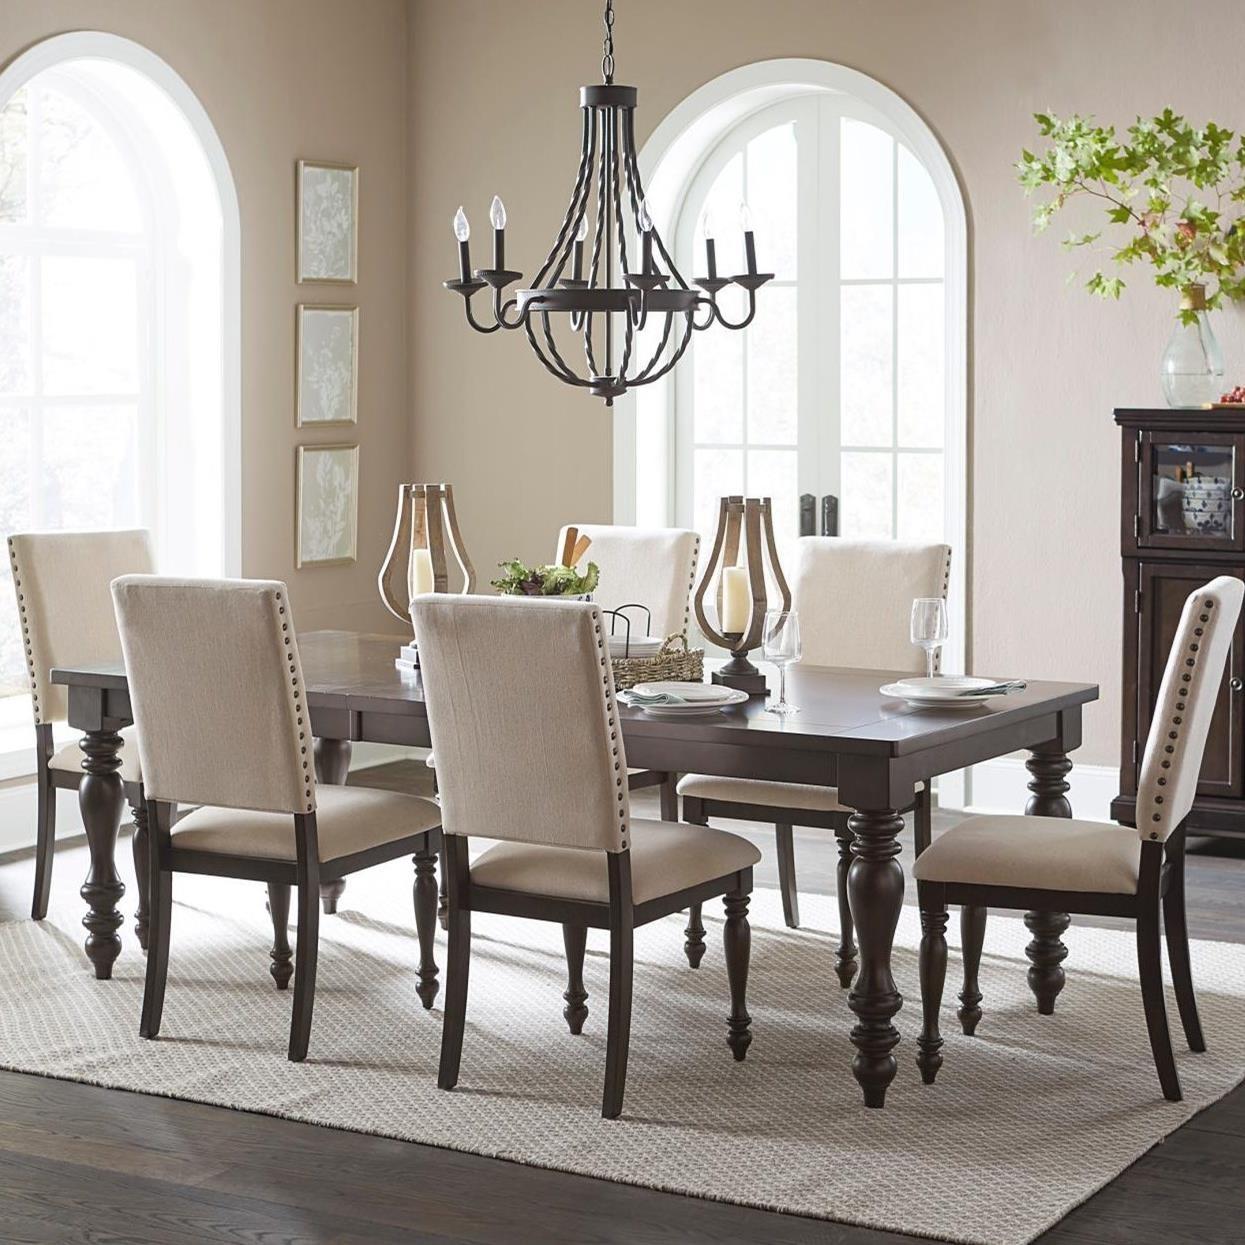 Darvin Furniture Prices Avis Rental Discount Code